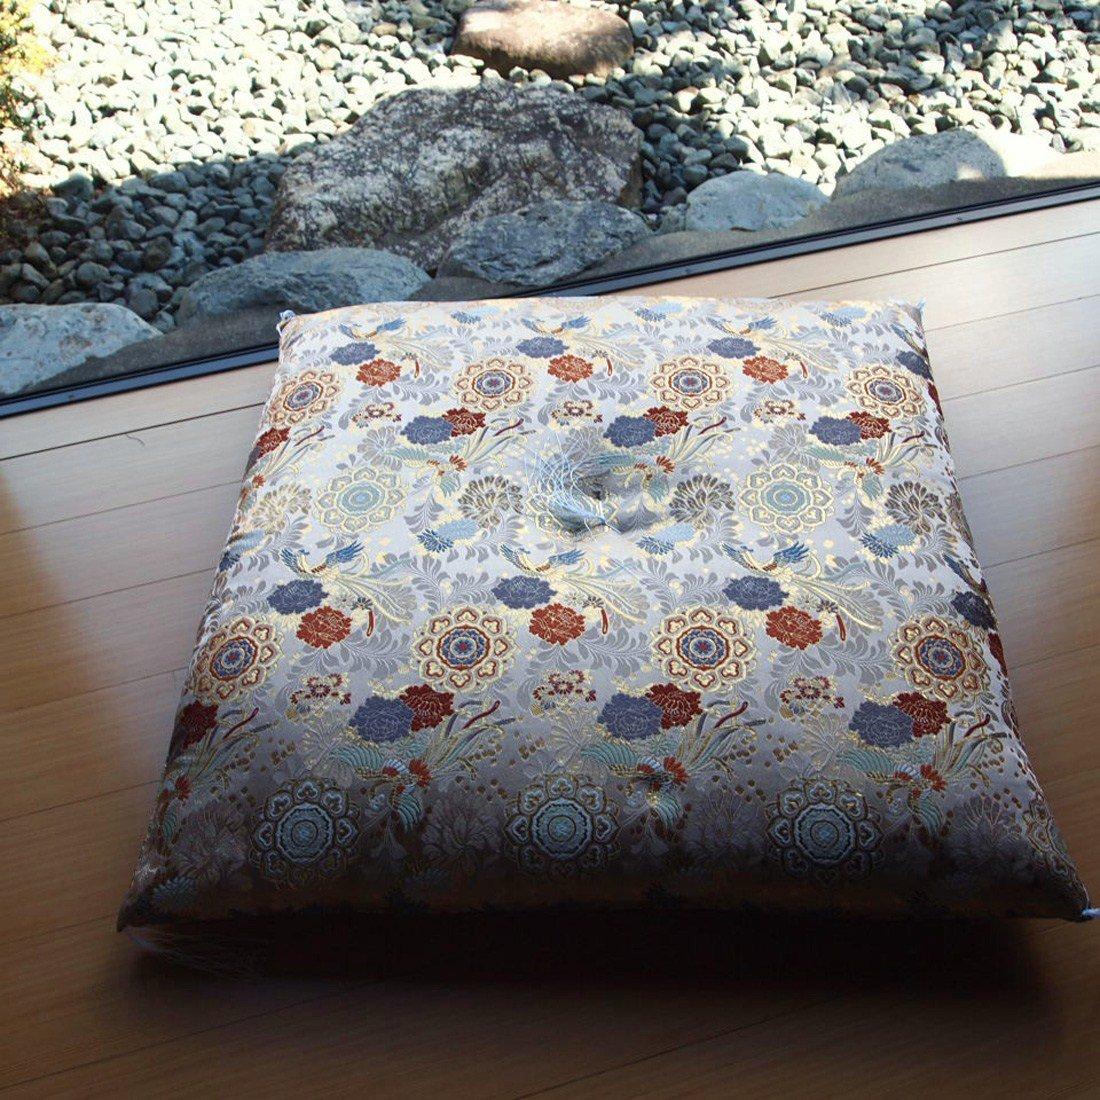 Four Seasons Handmade Japanese Brocade Fabric Zabuton Meditation Cushion 26.3× 26.7Inch(Compressed Cotton) by Four Seasons